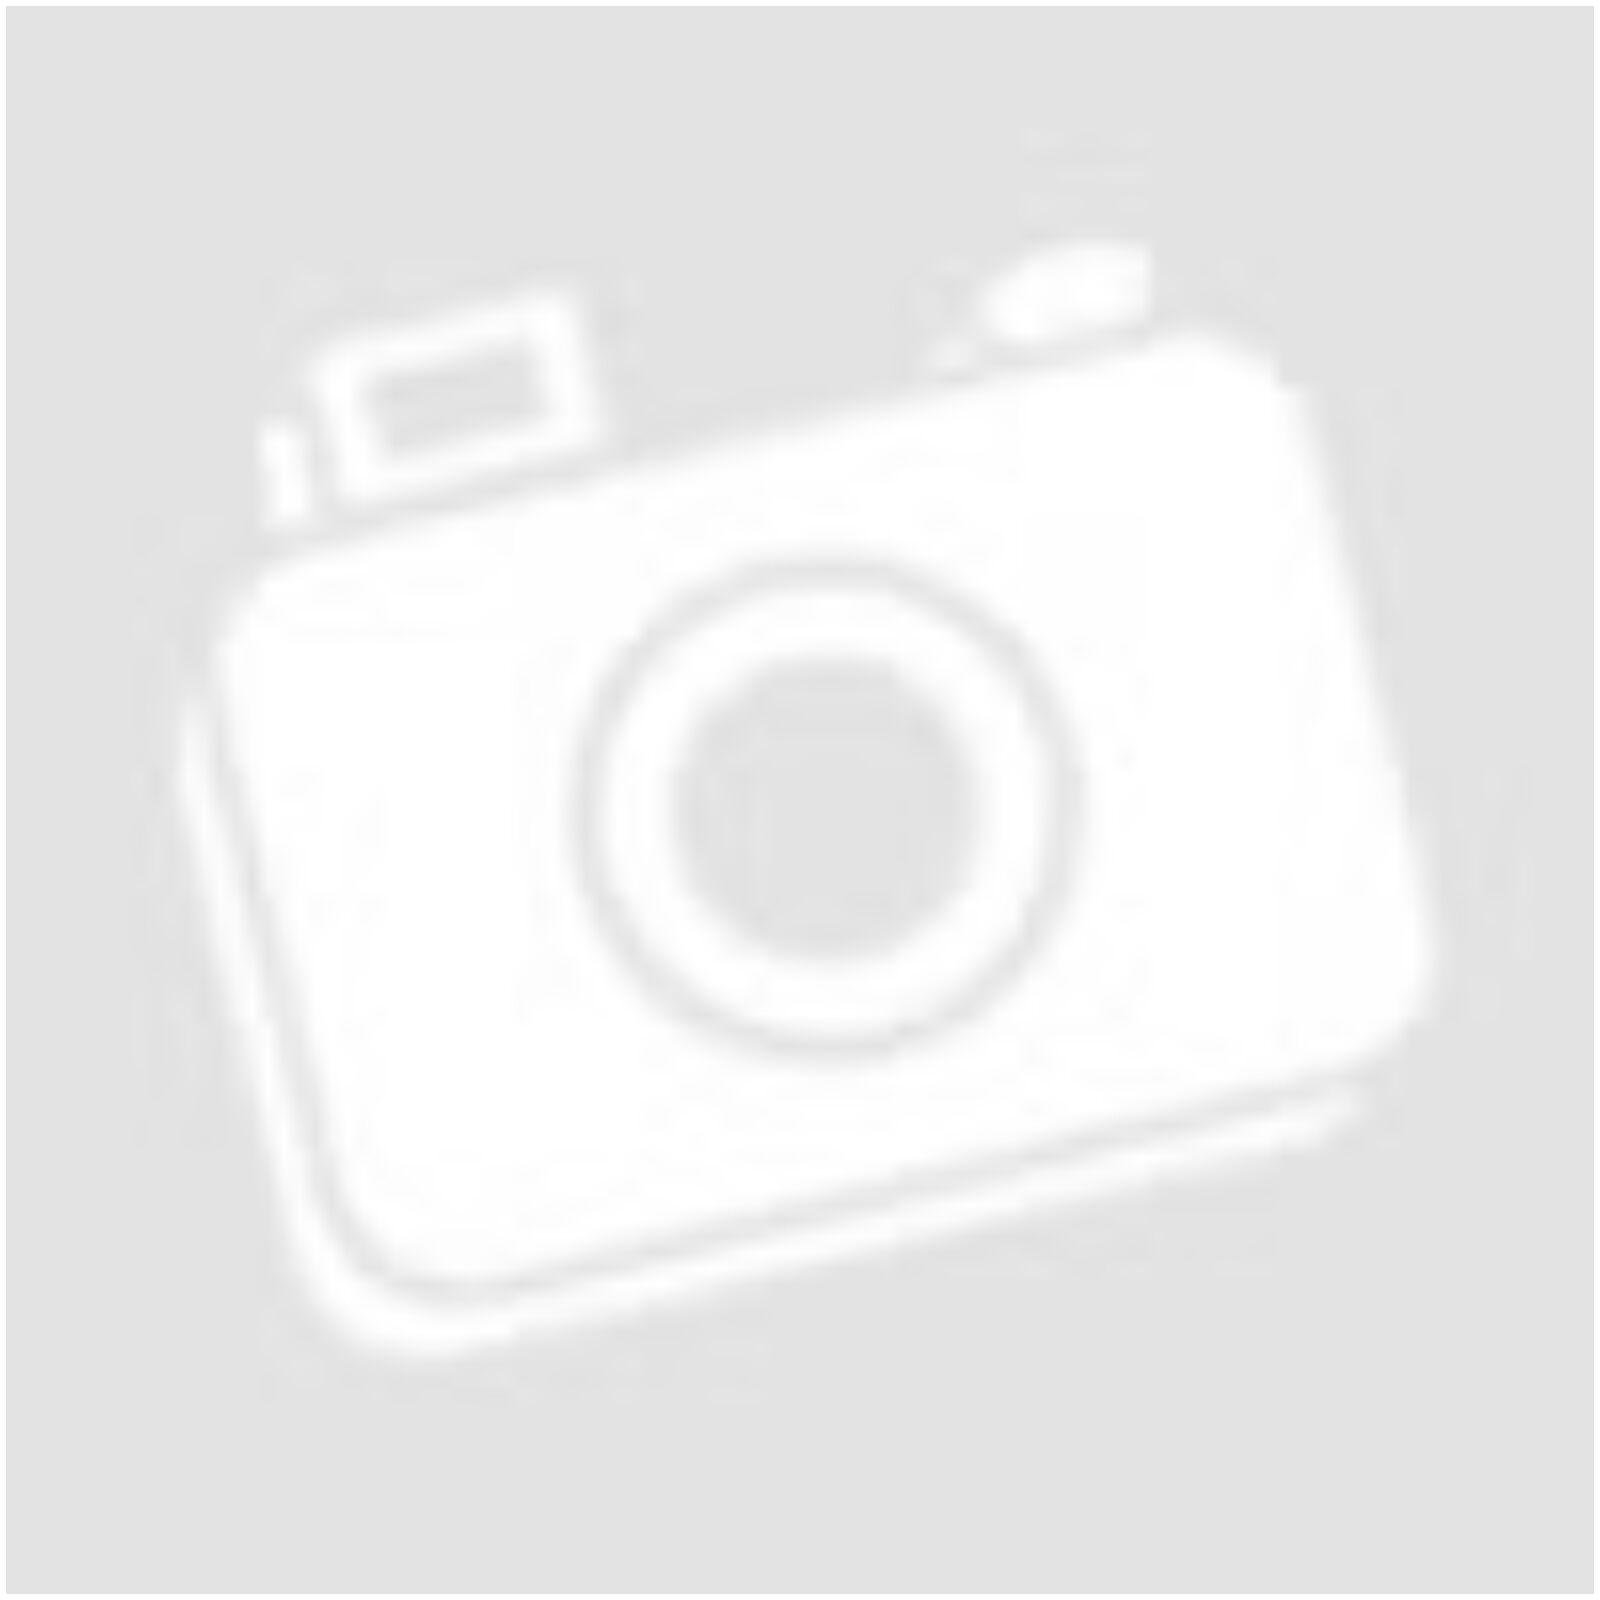 HARZO-3 Plusz Struktúr bevonat [20 kg]